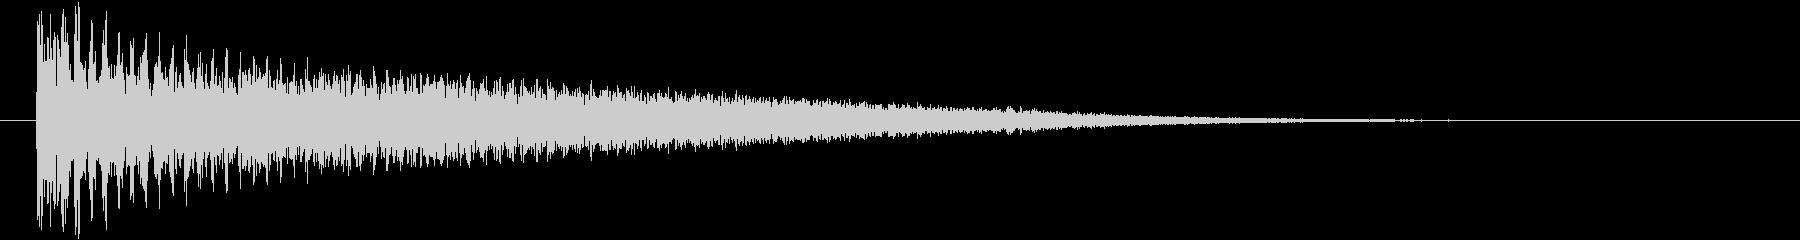 beam's unreproduced waveform